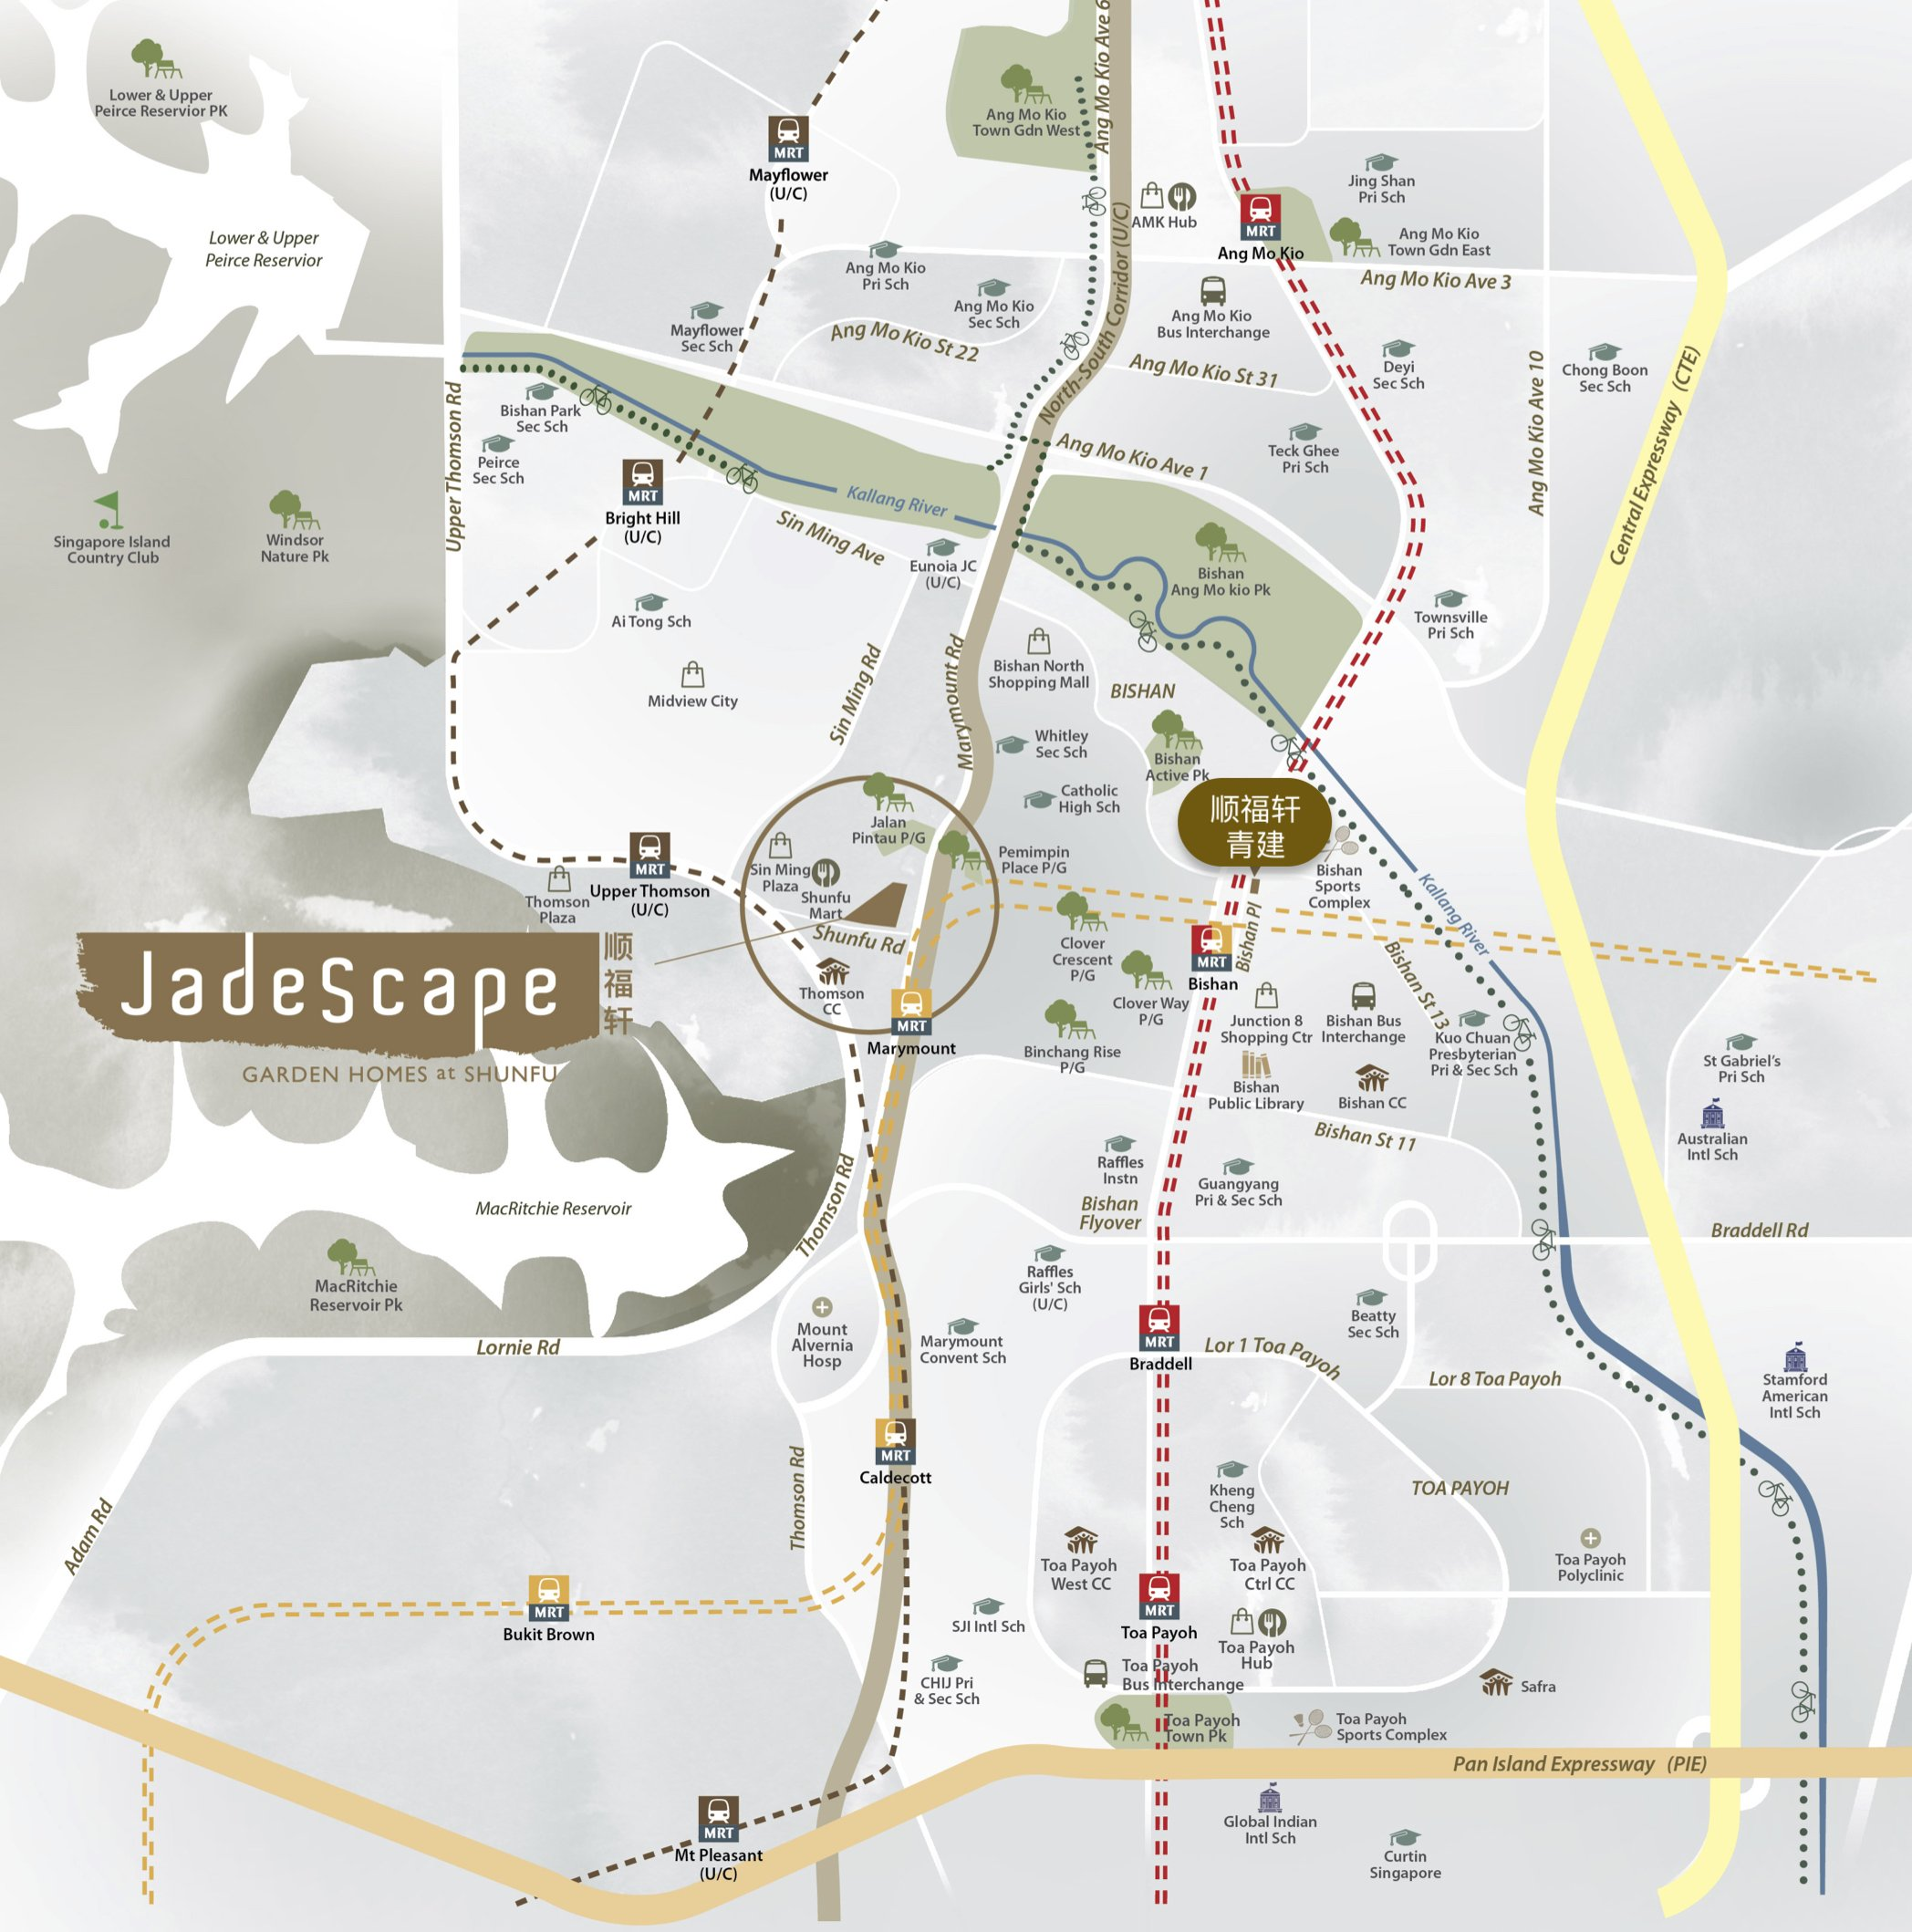 jadescape location map shunfu marymount bishan upper thomson